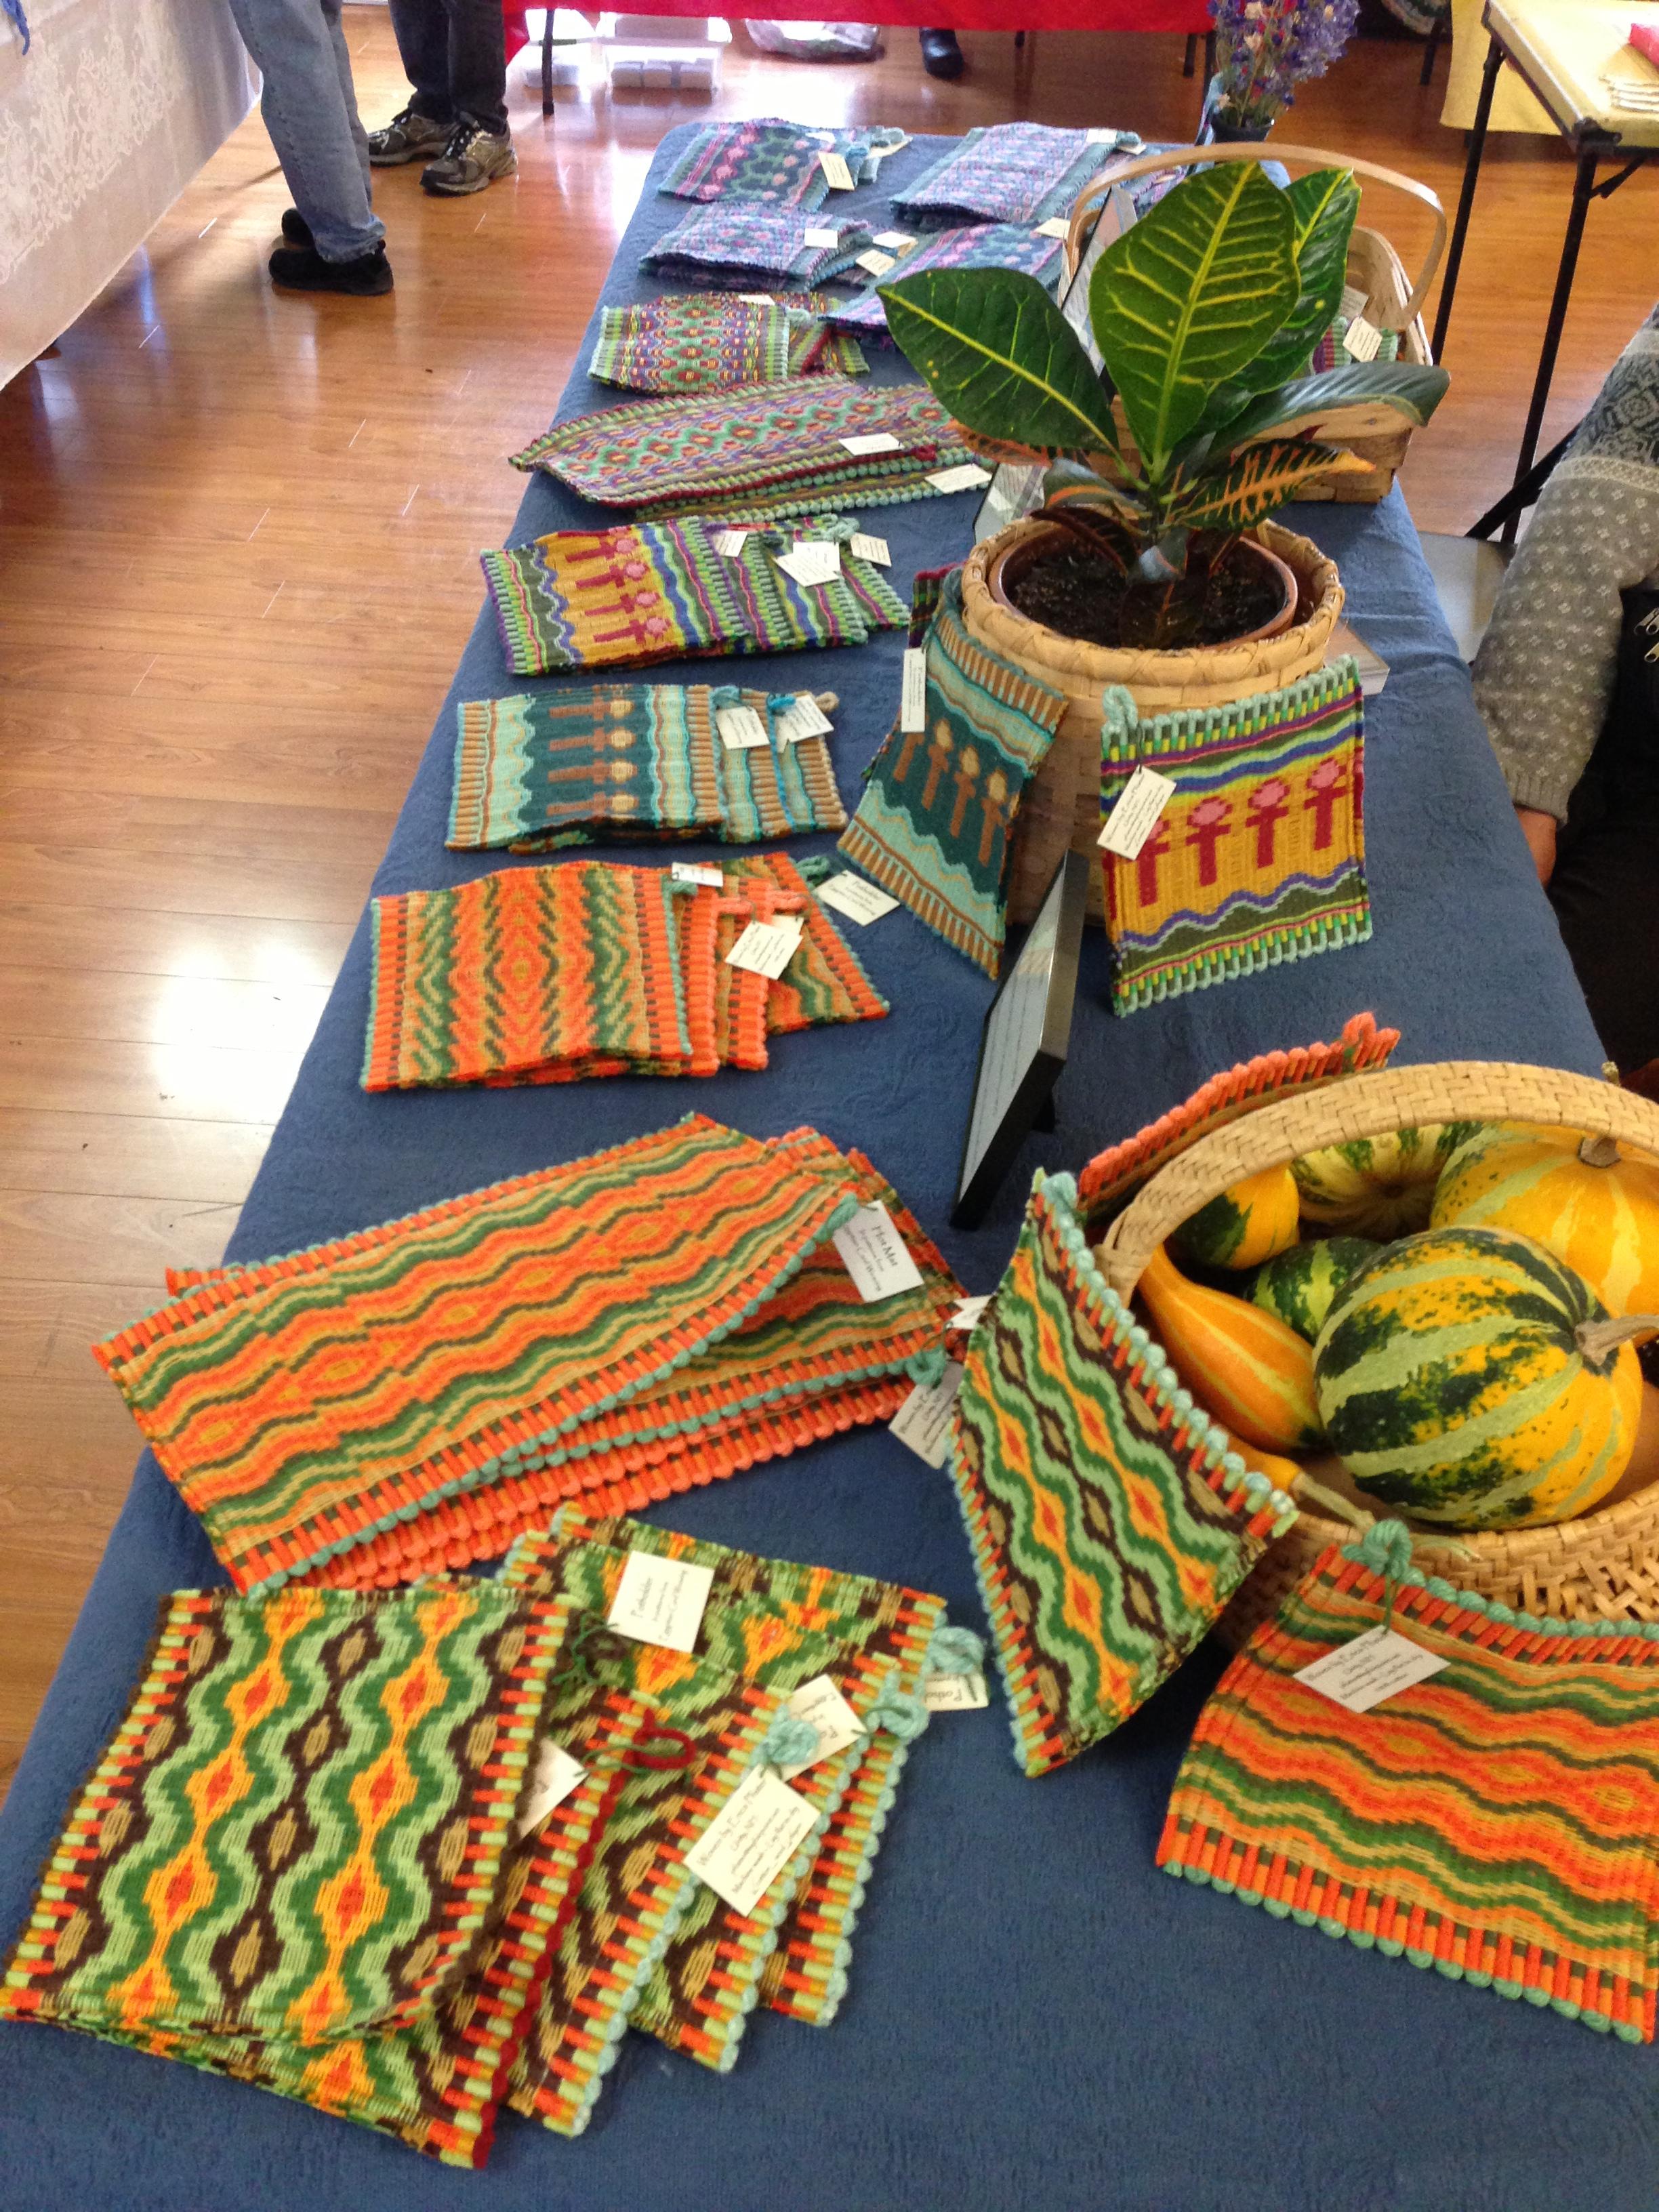 Hand woven mats by Pfister Rugs